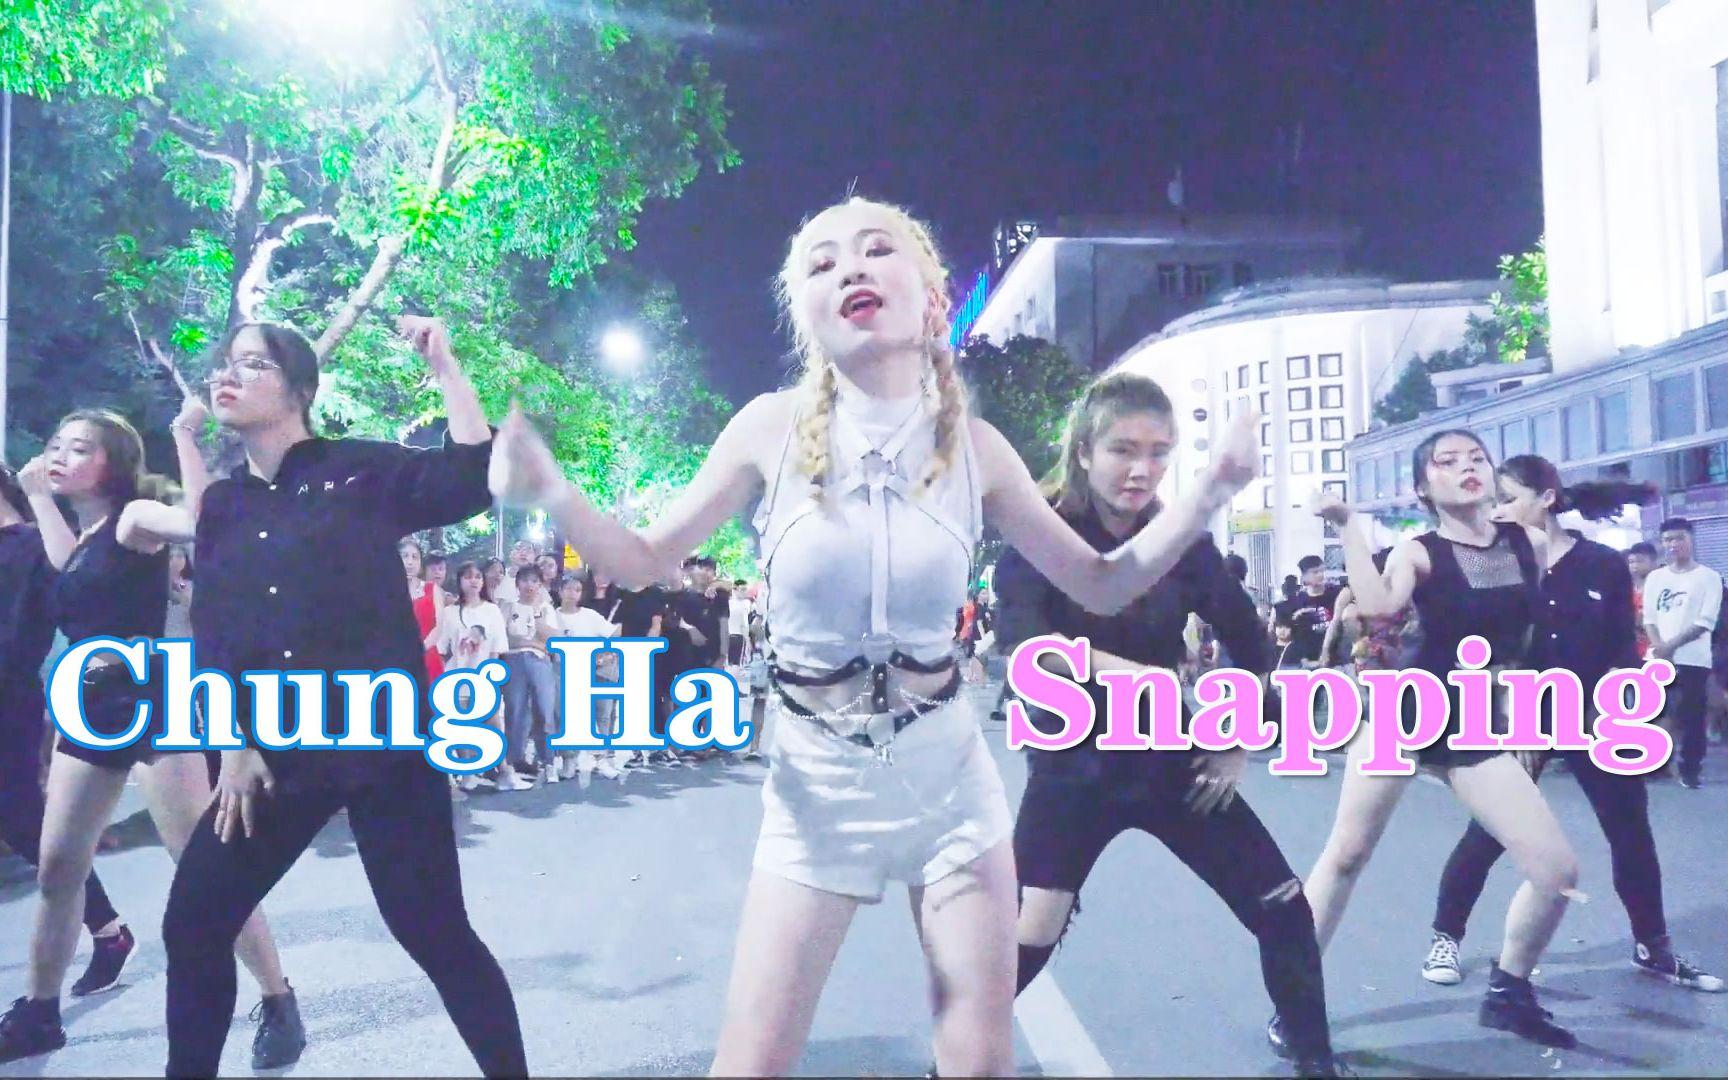 【金請夏】越南舞團翻跳 Snapping。在夜晚熱鬧的街頭跳起來……_嗶哩嗶哩 (゜-゜)つロ 干杯~-bilibili